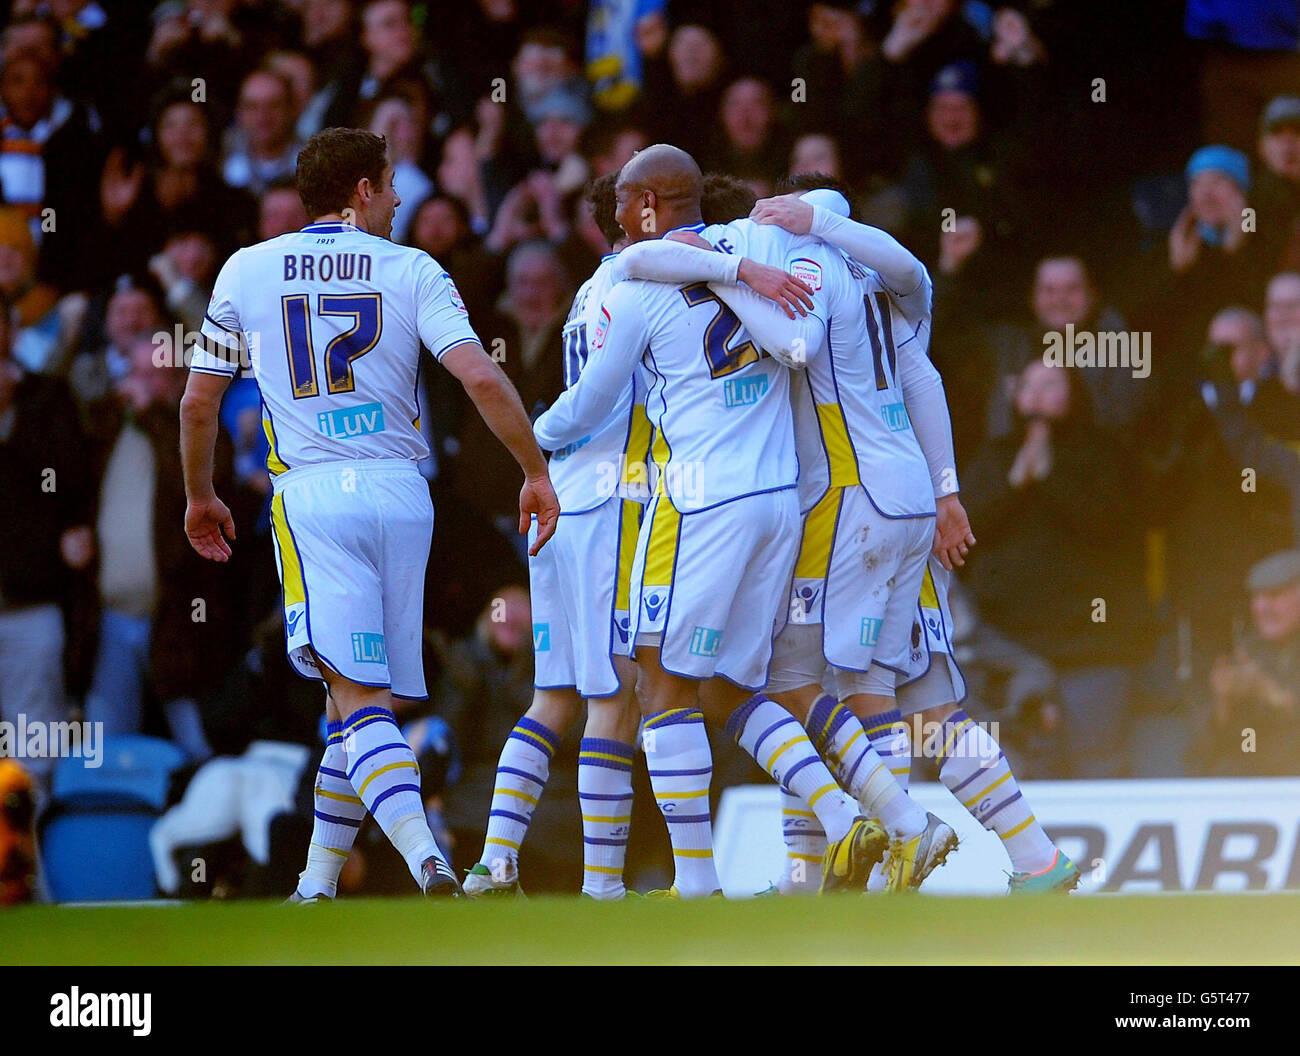 Soccer - FA Cup - Fourth Round - Leeds United v Tottenham Hotspur - Elland Road - Stock Image